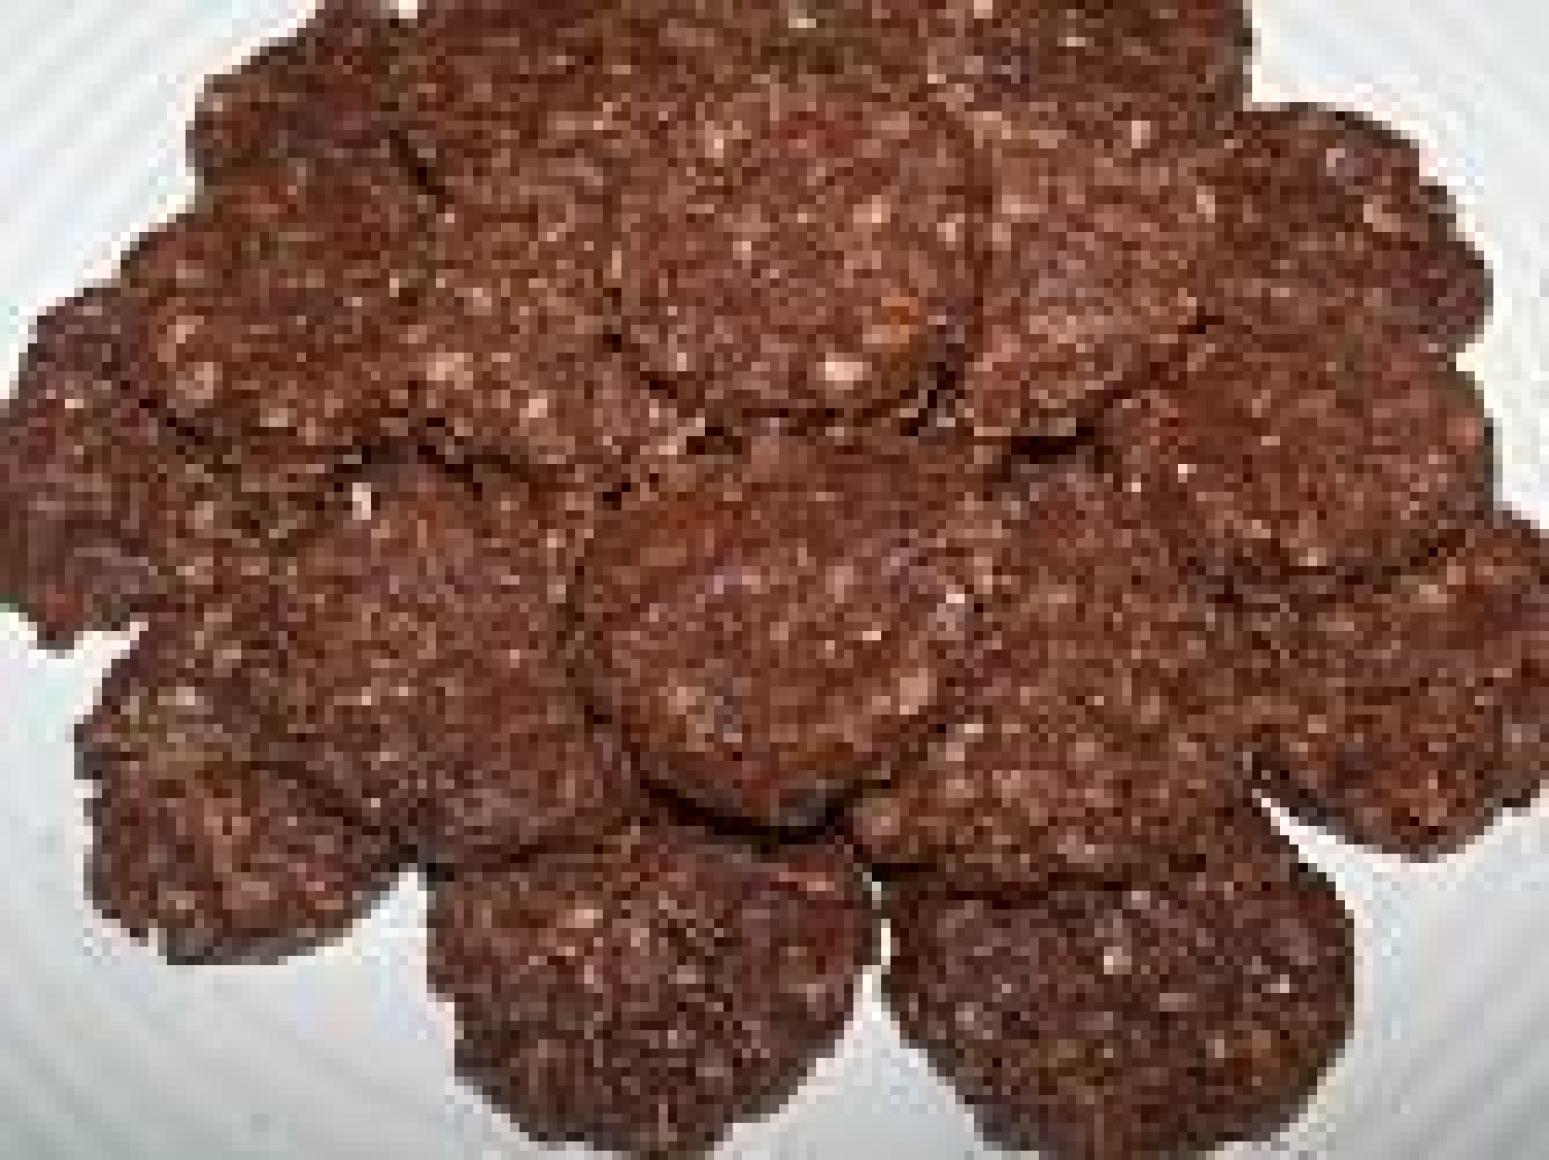 Mocha Cappuccino Hazelnut No Bake Cookies-Annette Recipe